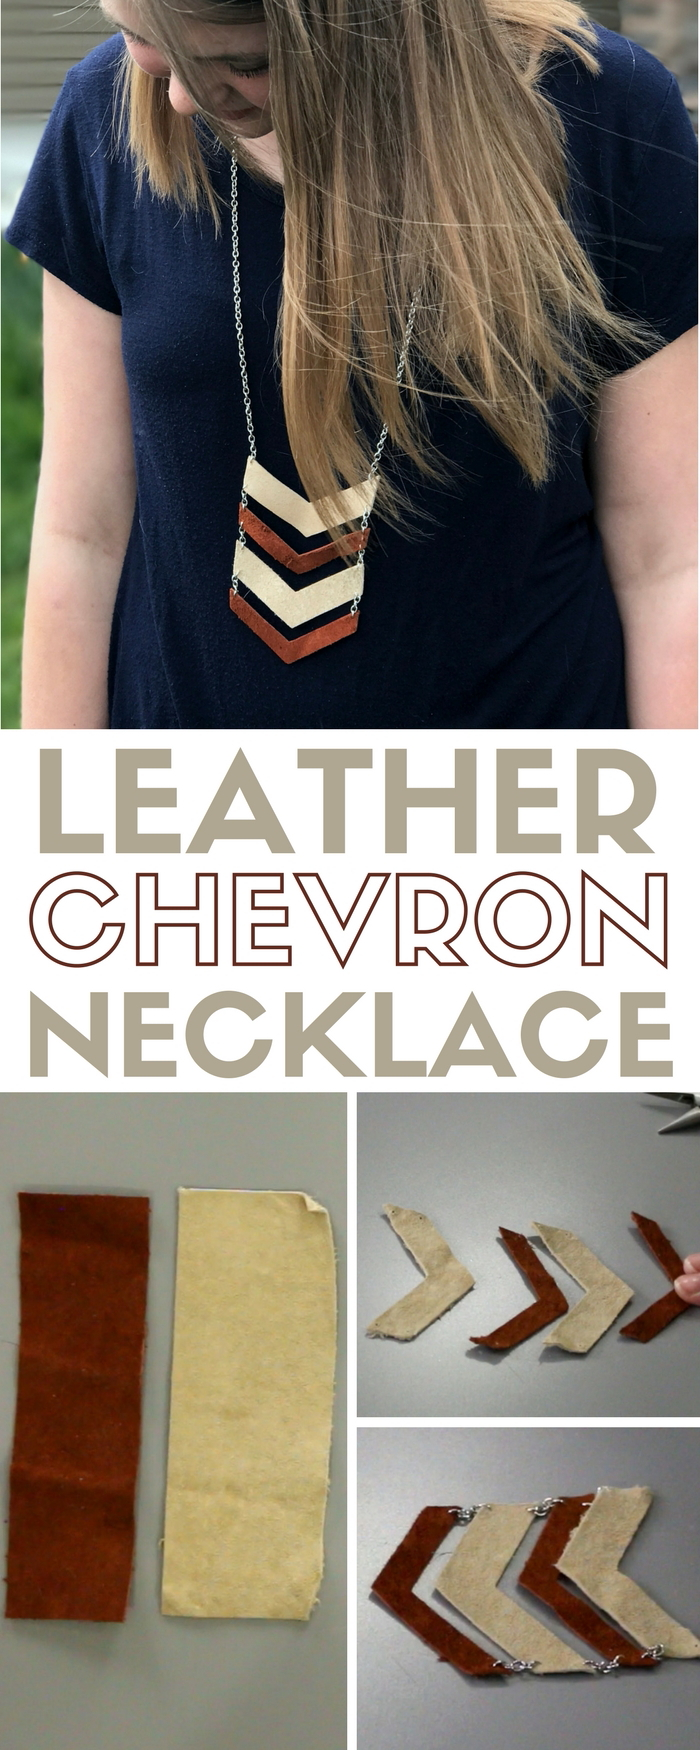 Leather Chevron Necklace | DIY Jewelry | Handmade Jewelry | Cricut Explore | Deep Cut Blade